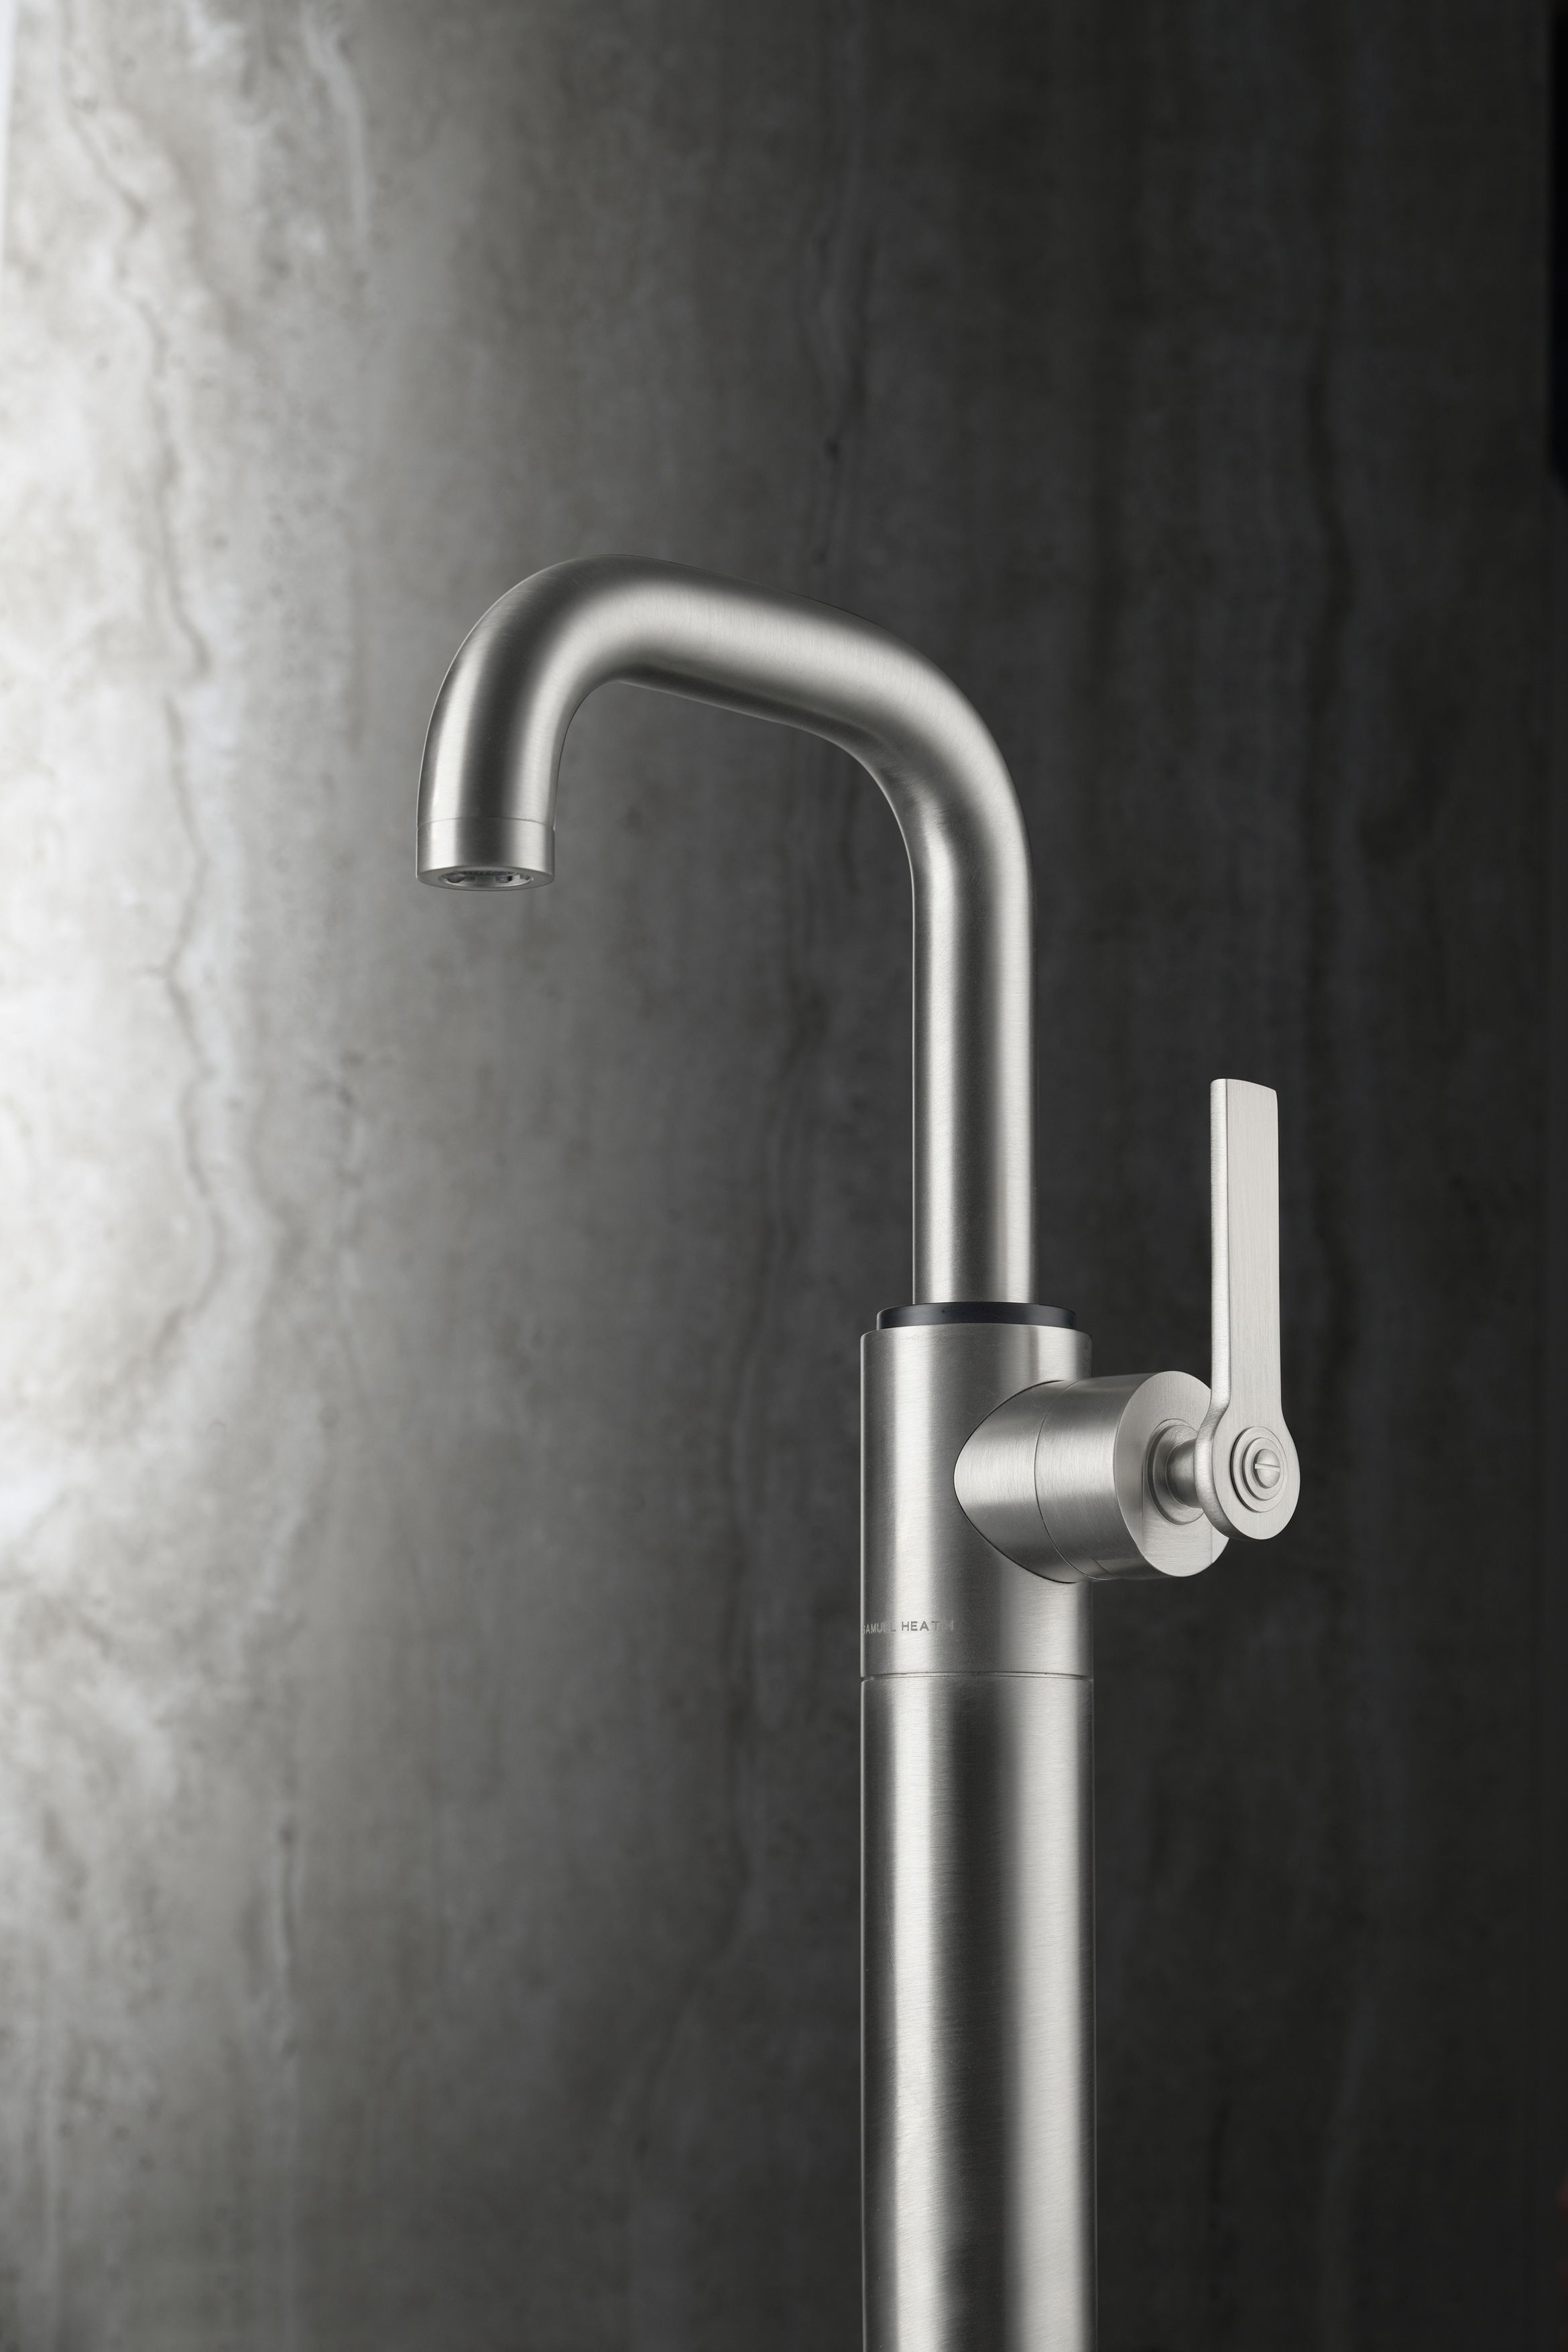 Landmark Pure Stainless Steel Basin Mixer Kitchen Tap Pure Products Basin Mixer Basin